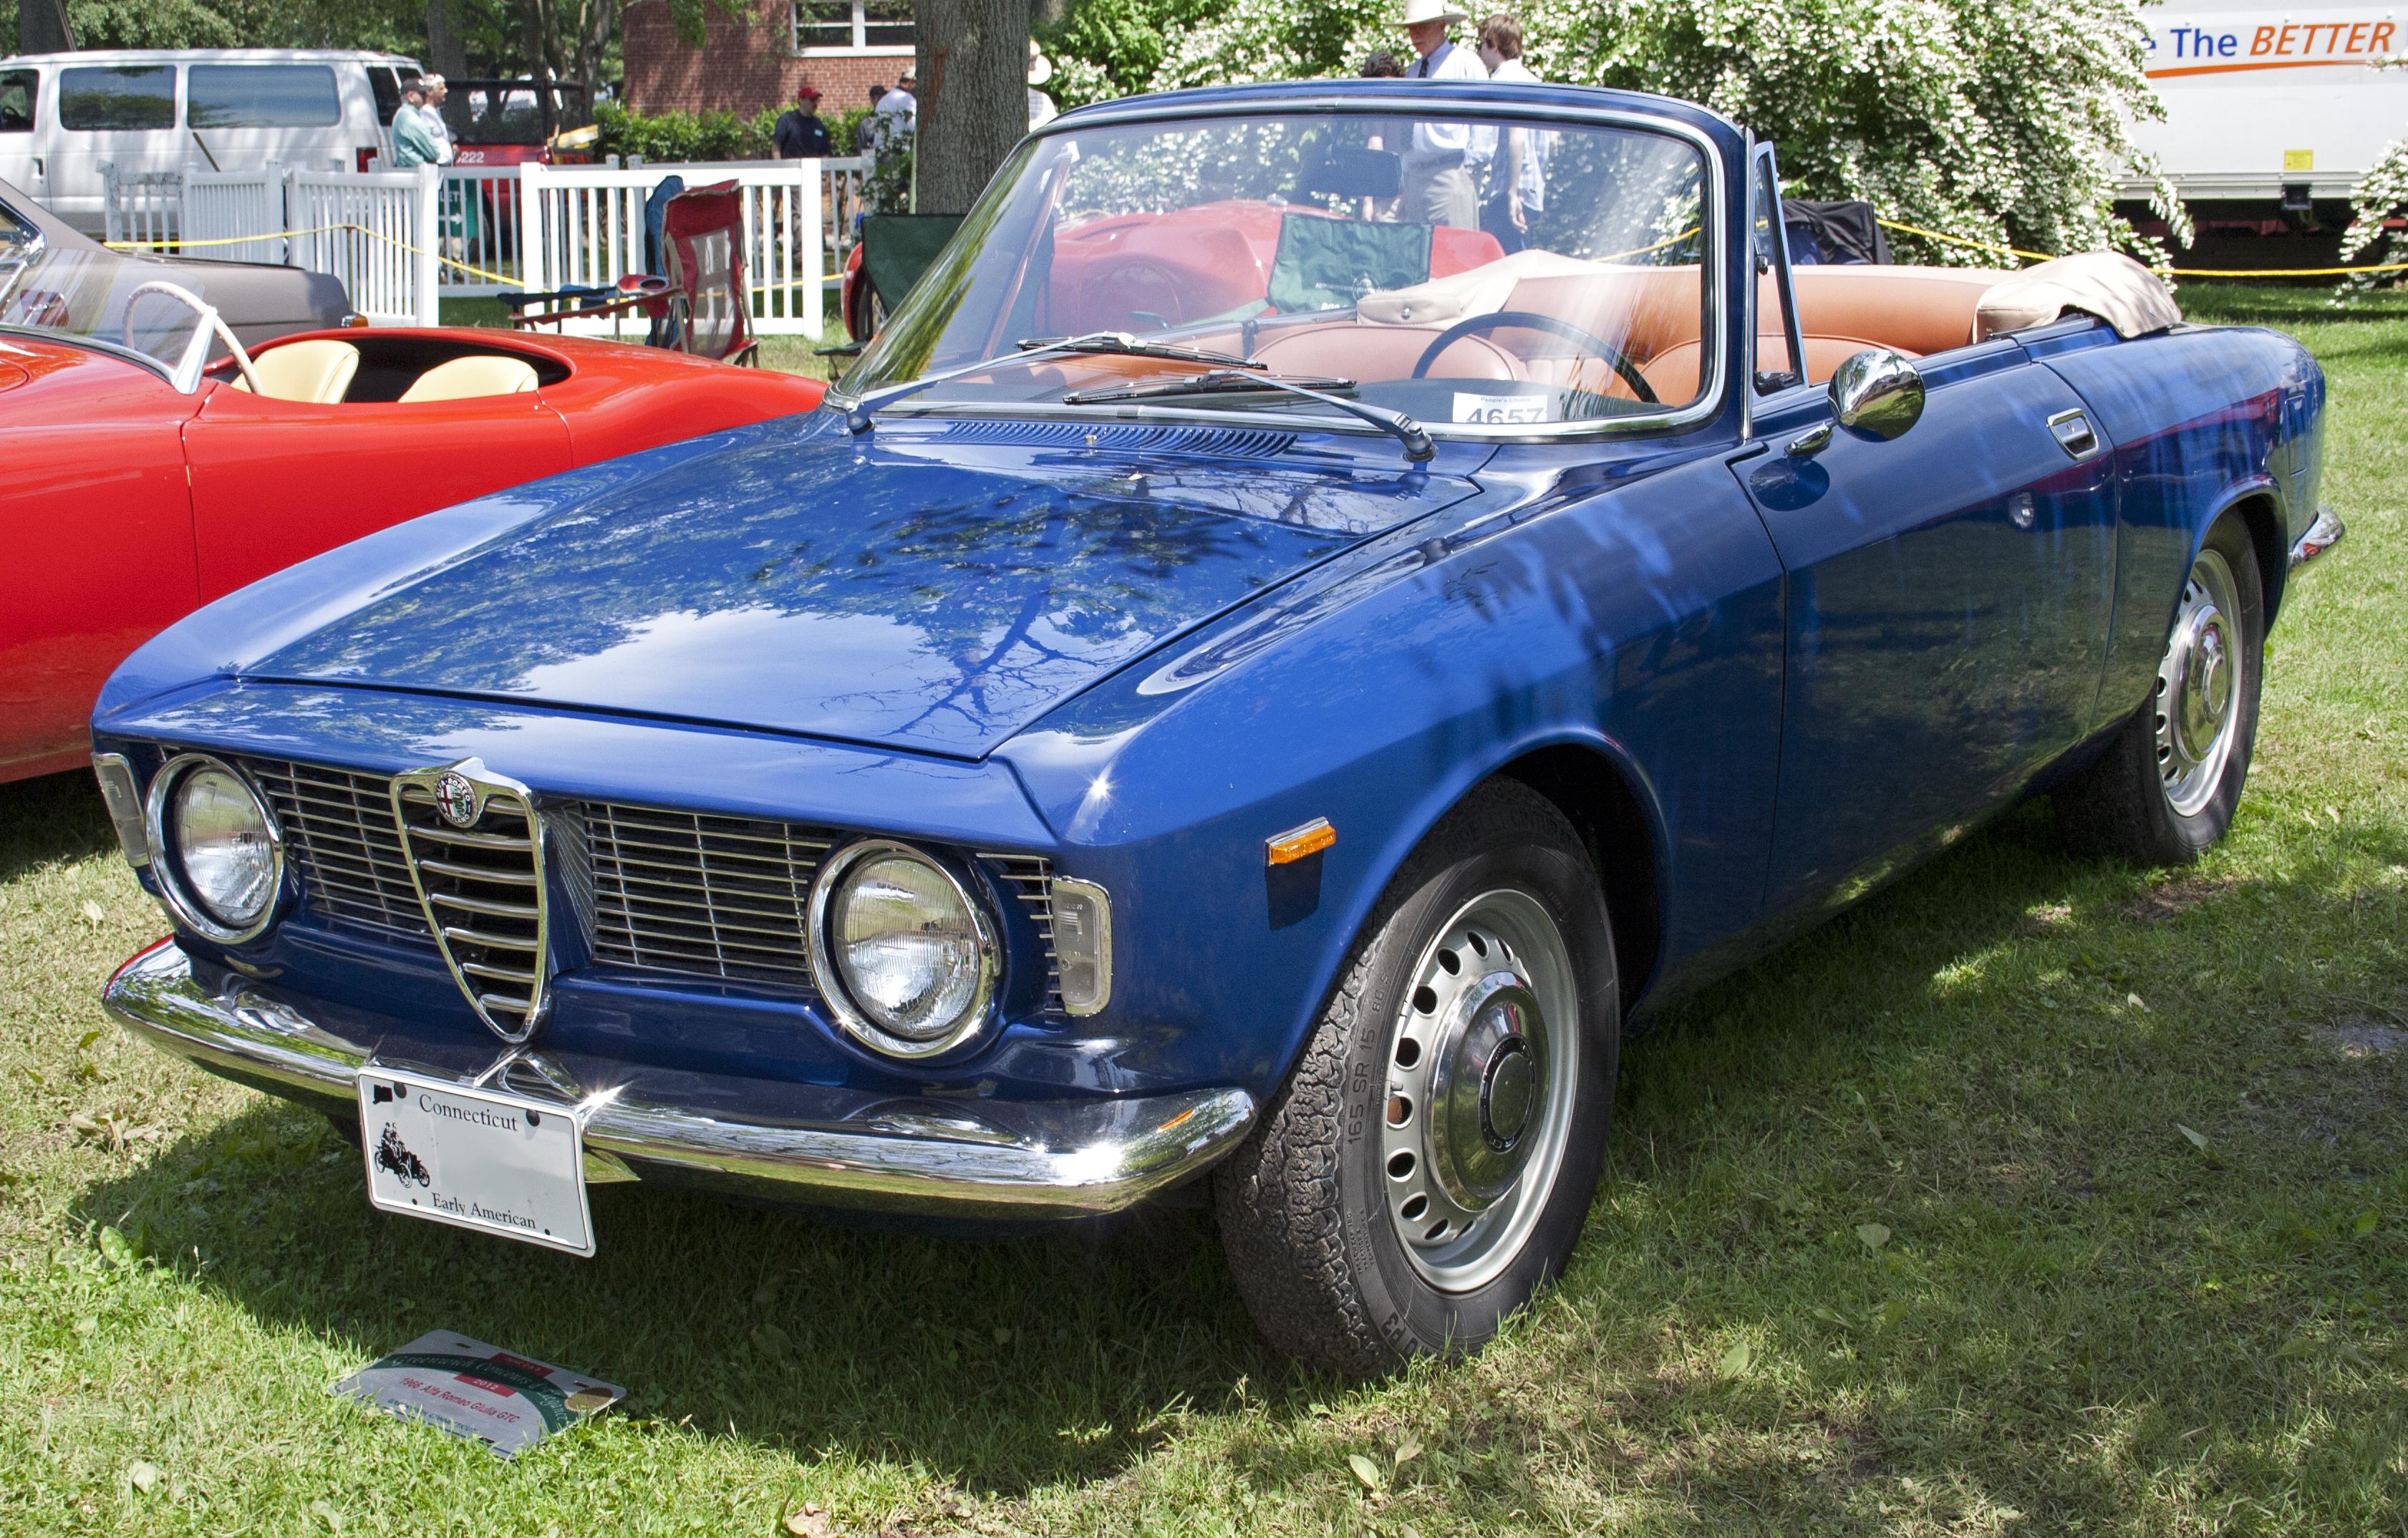 Alfa Romeo Giulia Wikipedia 159 Workshop Manual Download Gtc Spider